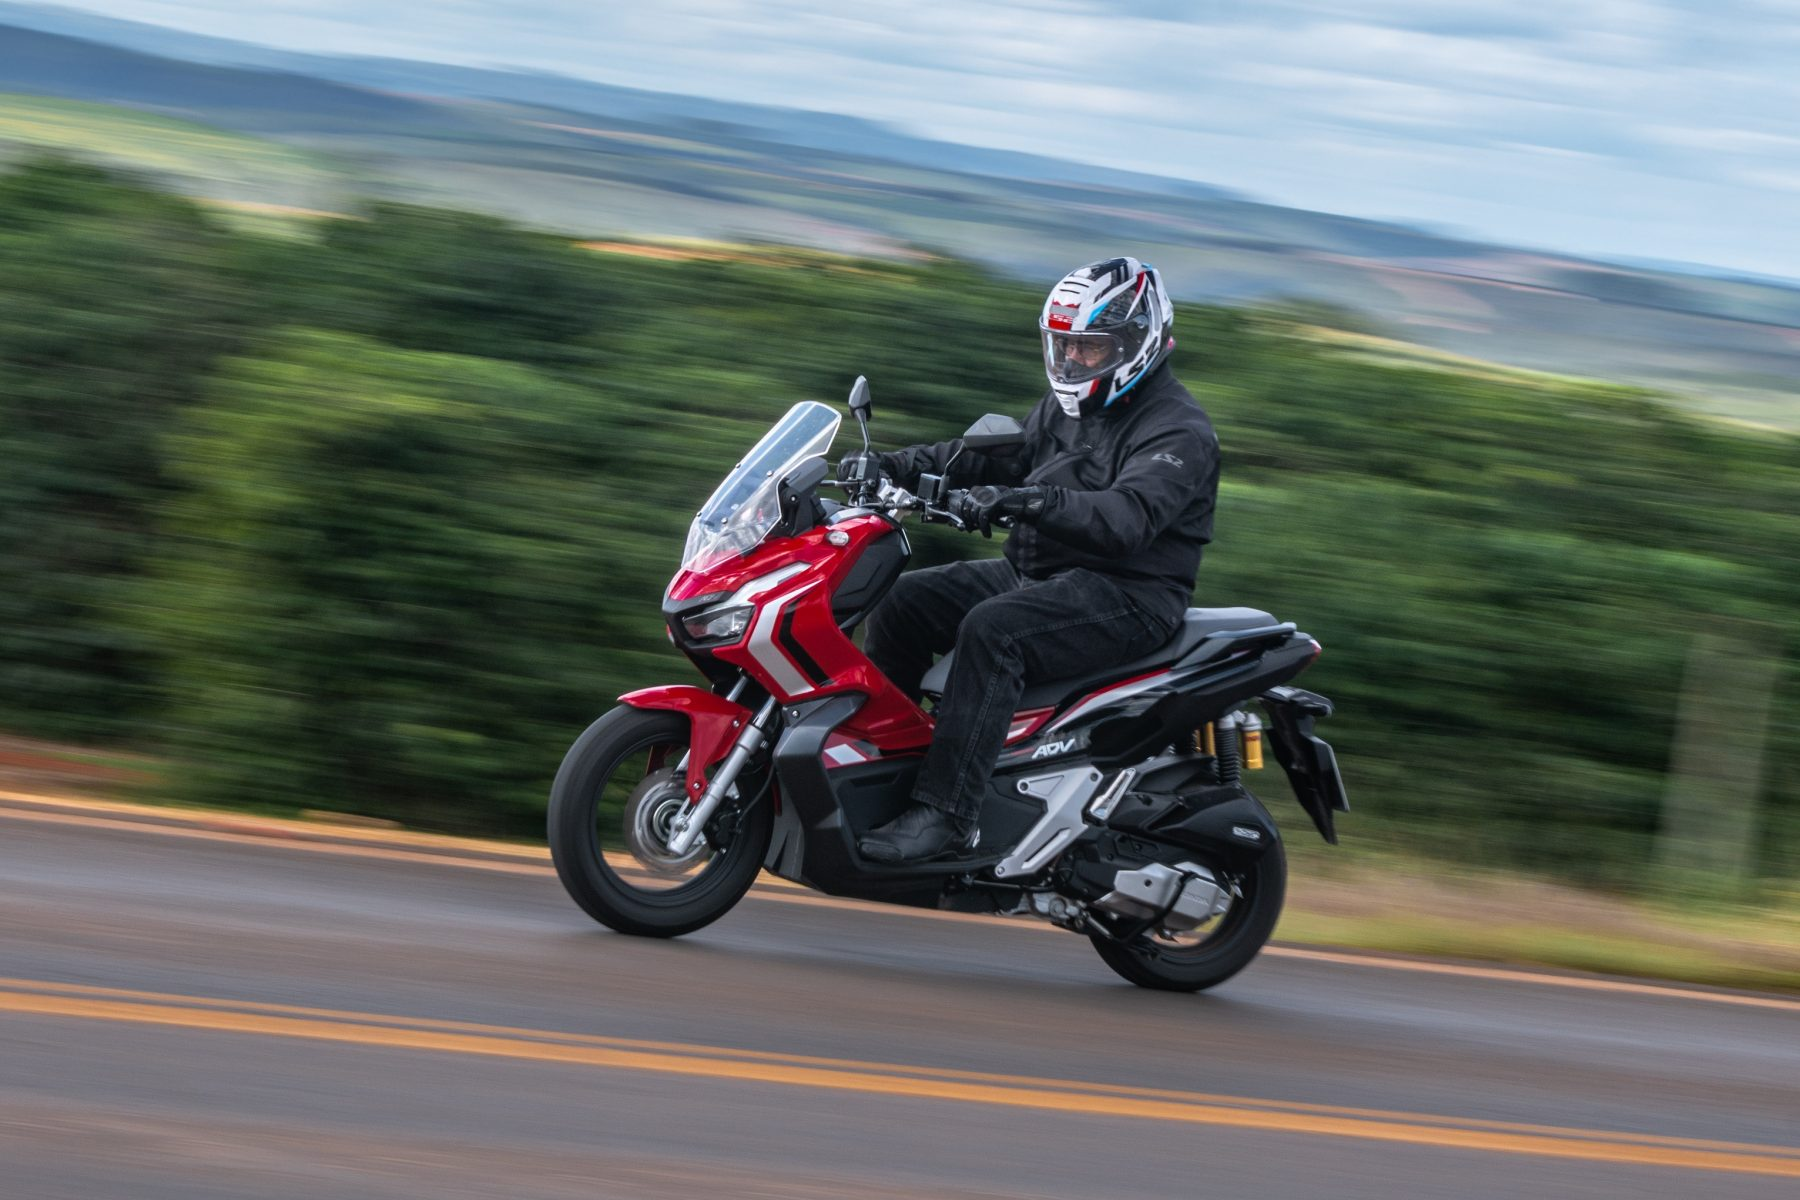 scooter honda adv 150 impressoes 14